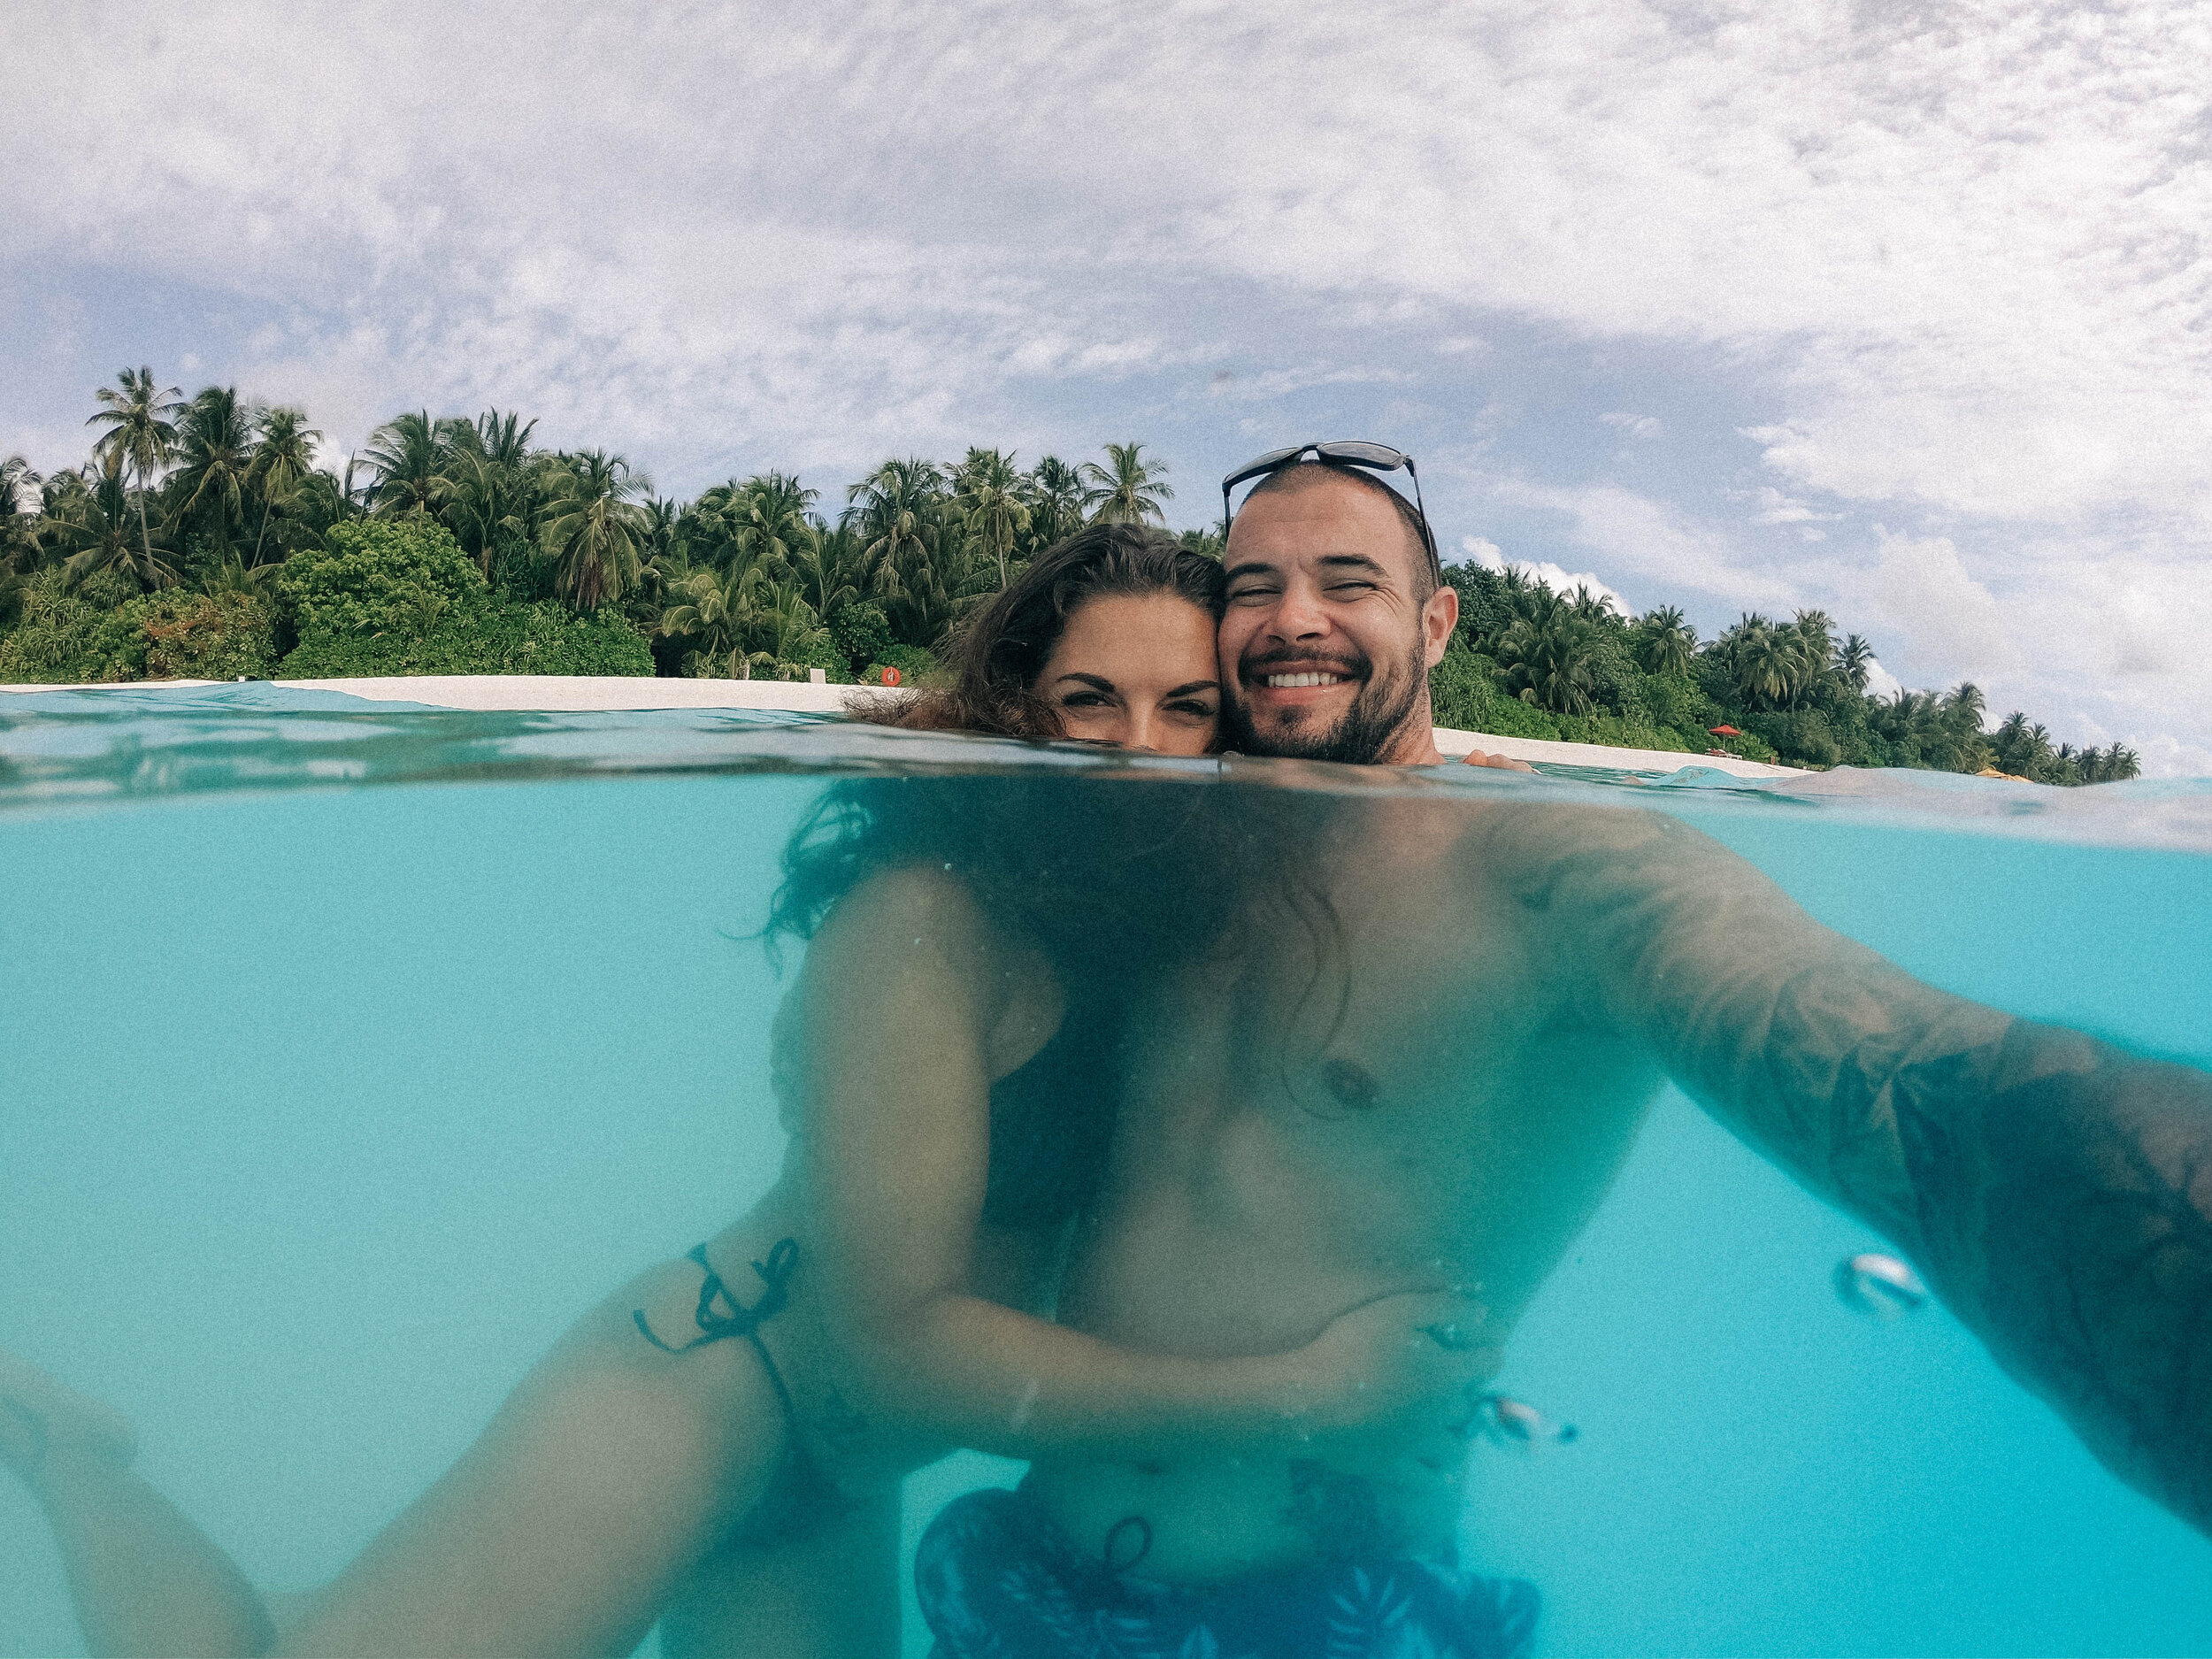 Niyama maldives,